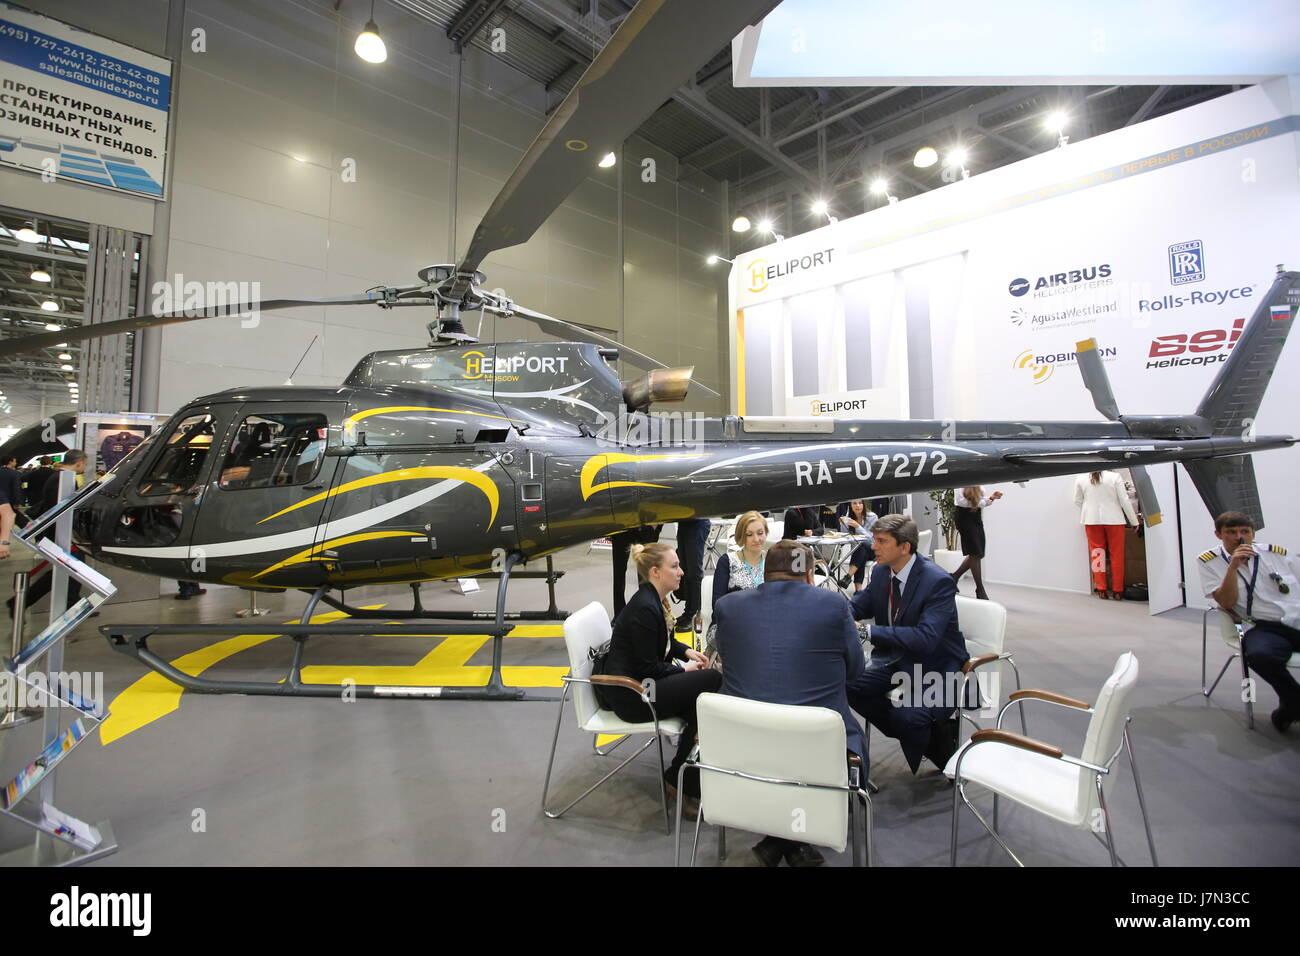 Elicottero 350 : Aerospatiale as 350 ecureuil immagini & aerospatiale as 350 ecureuil